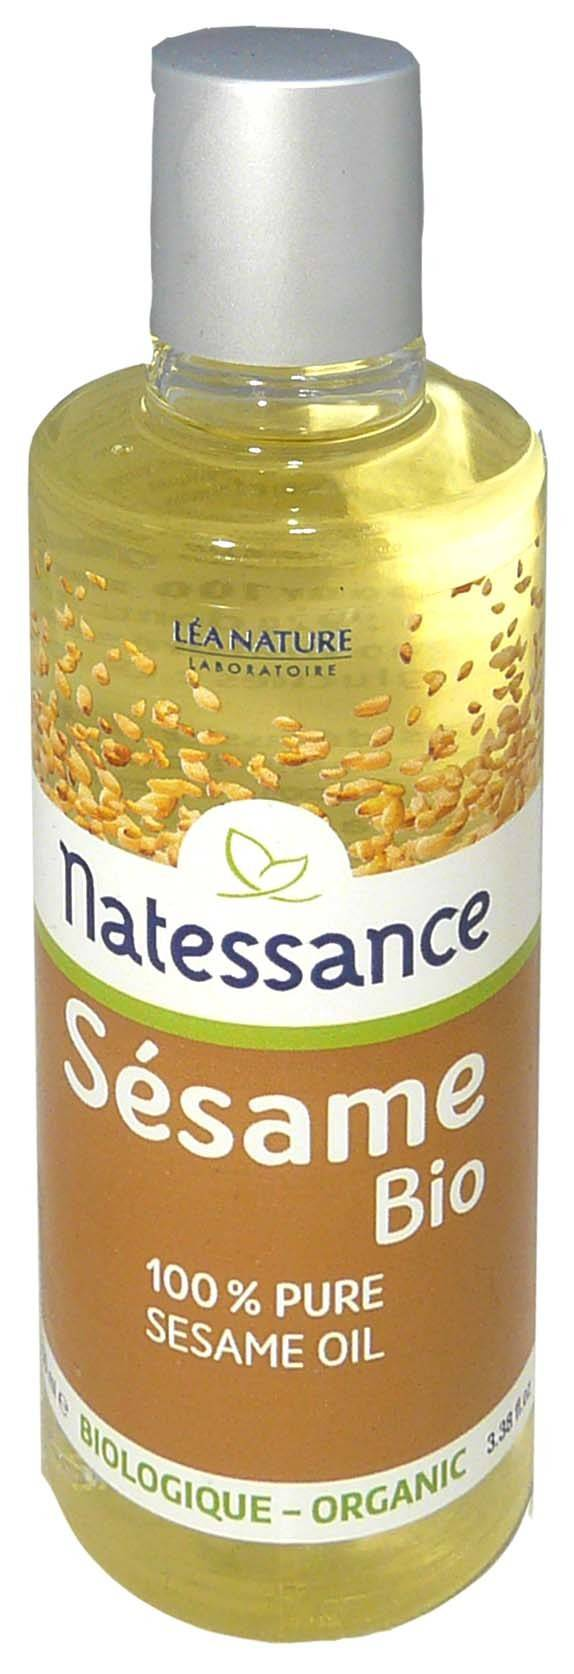 Natessance huile sesame bio 100ml